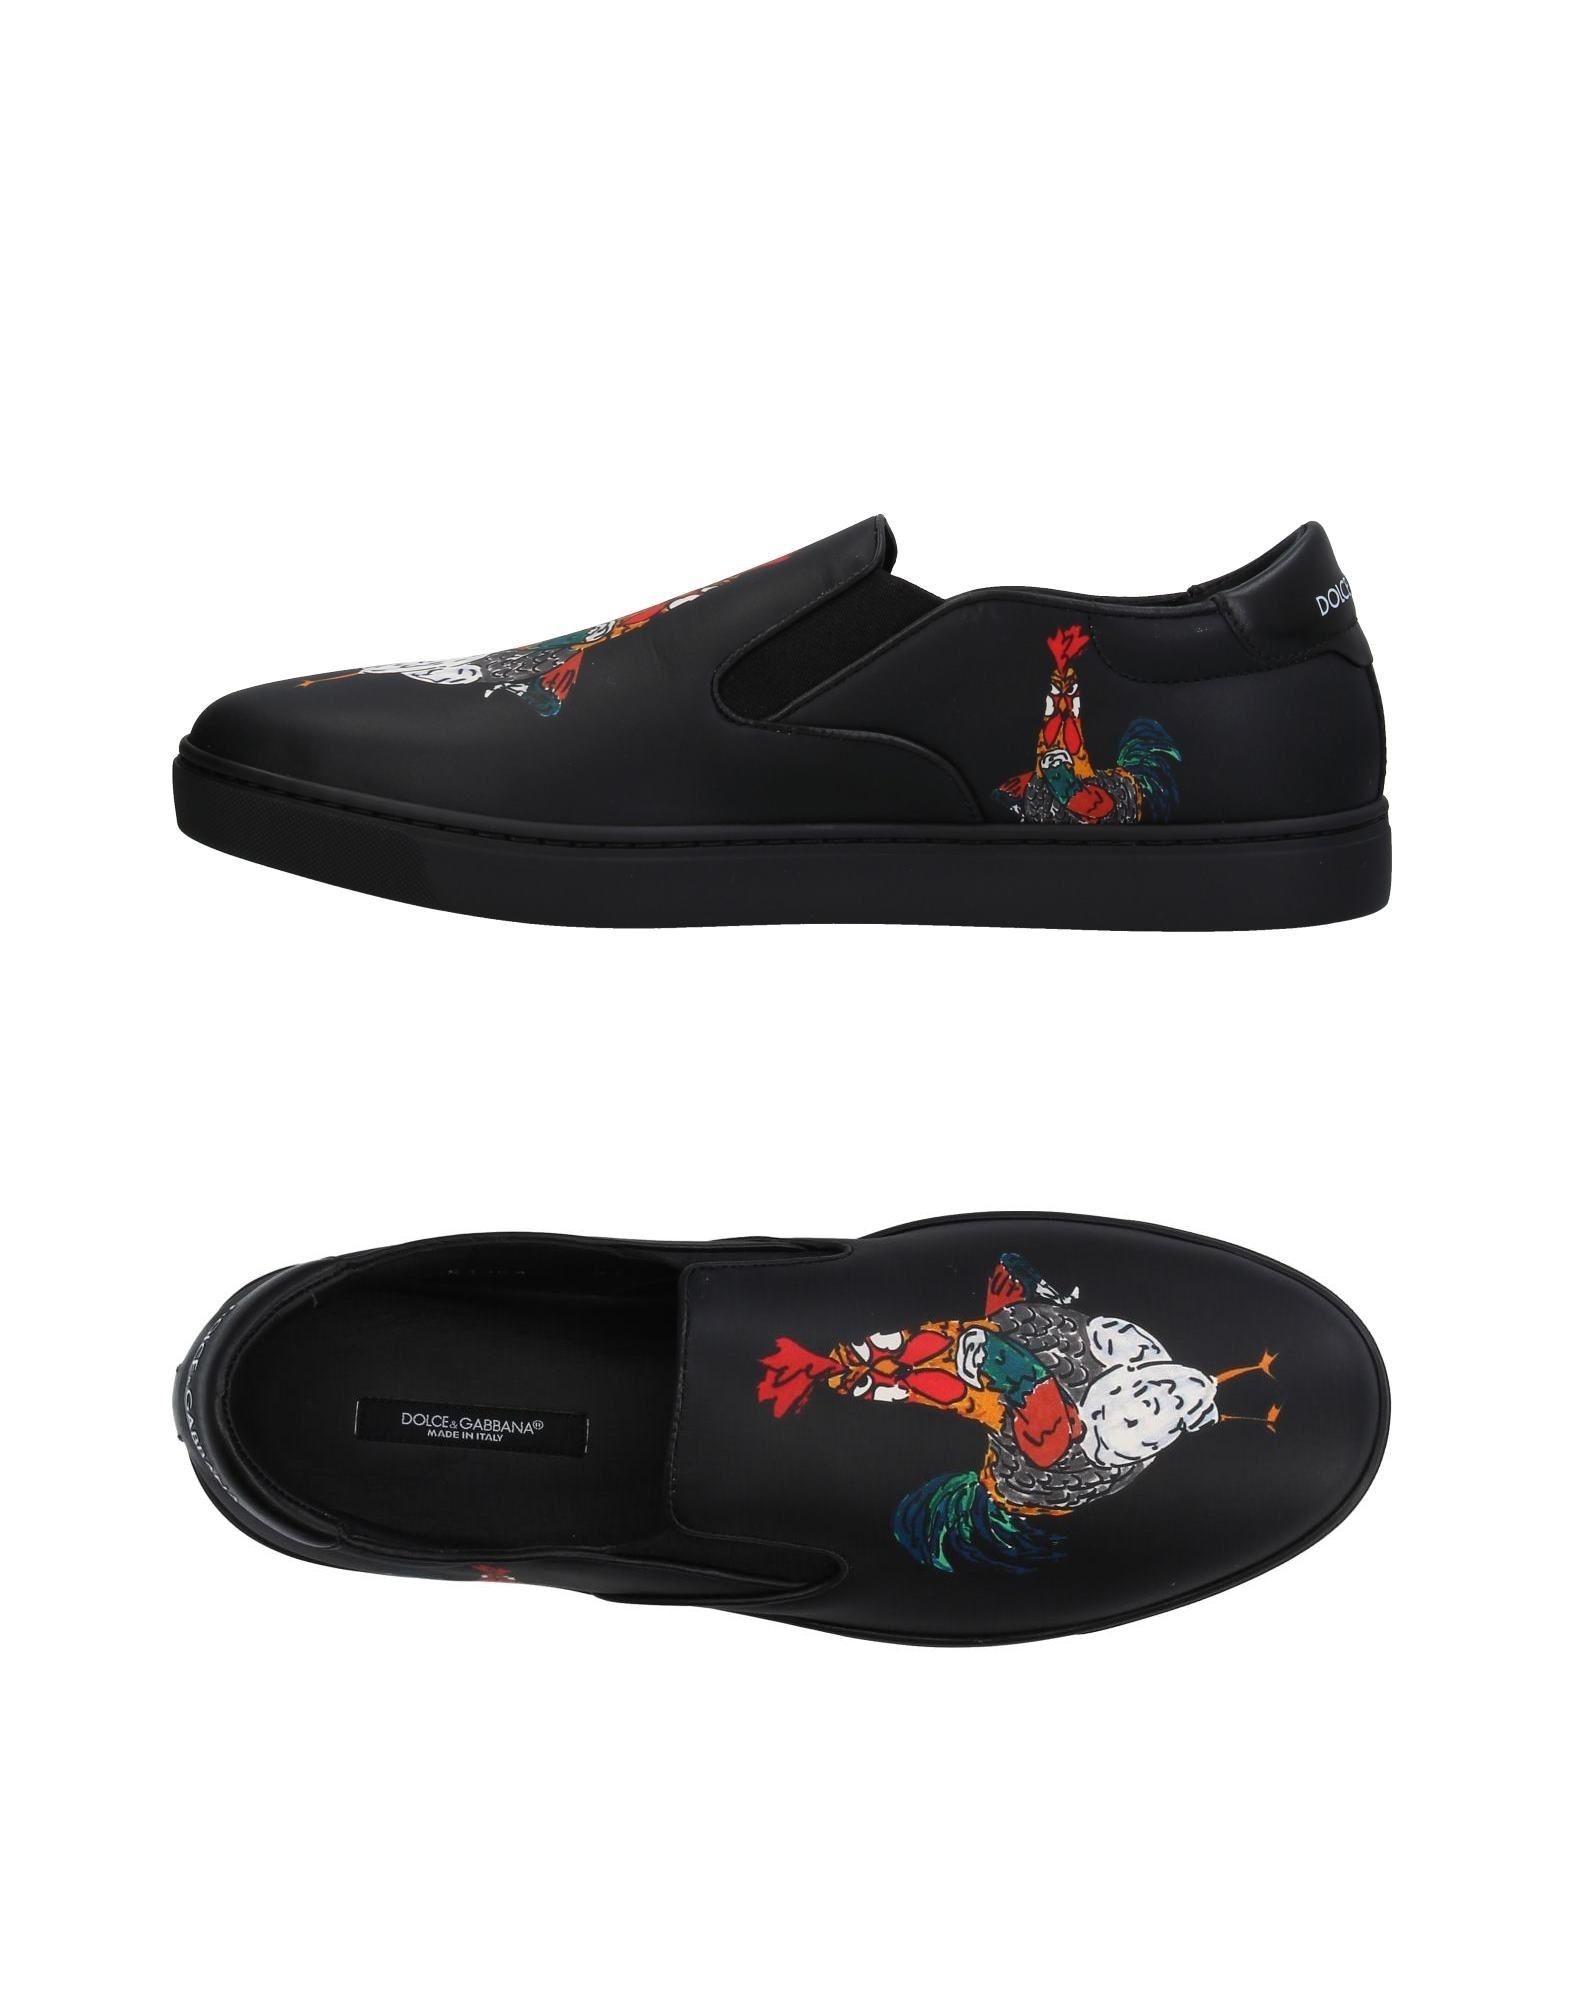 Dolce & Gabbana Sneakers Herren  11393129GP Gute Qualität beliebte Schuhe